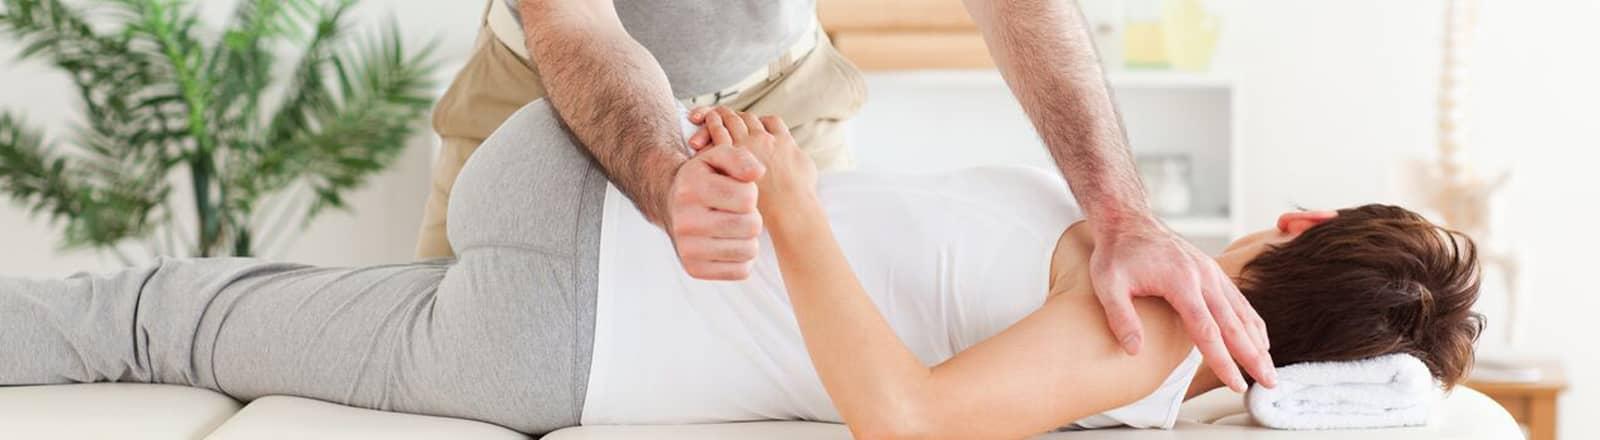 osteopatia visceral Logroño